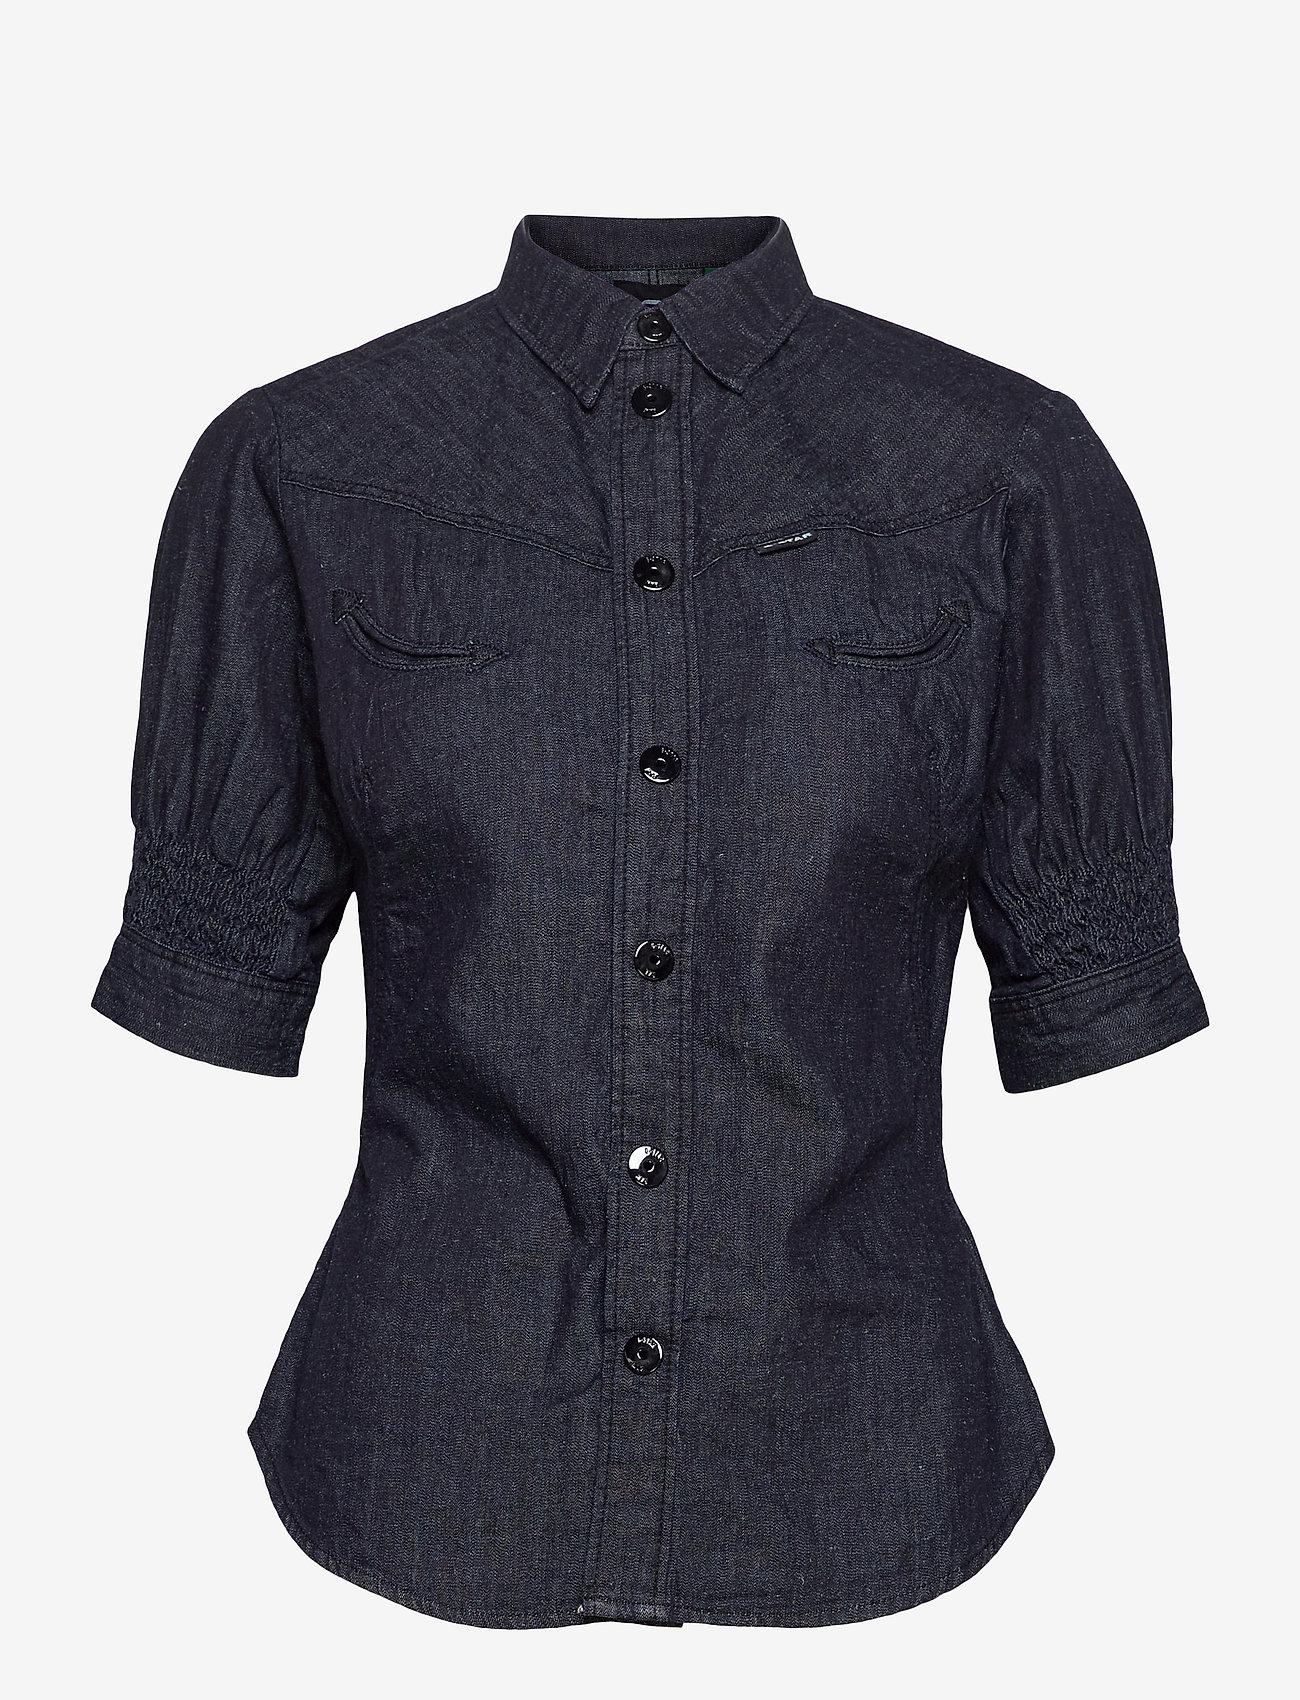 G-star RAW - Smock western kick back shirt wmn s - overhemden met korte mouwen - rinsed - 0